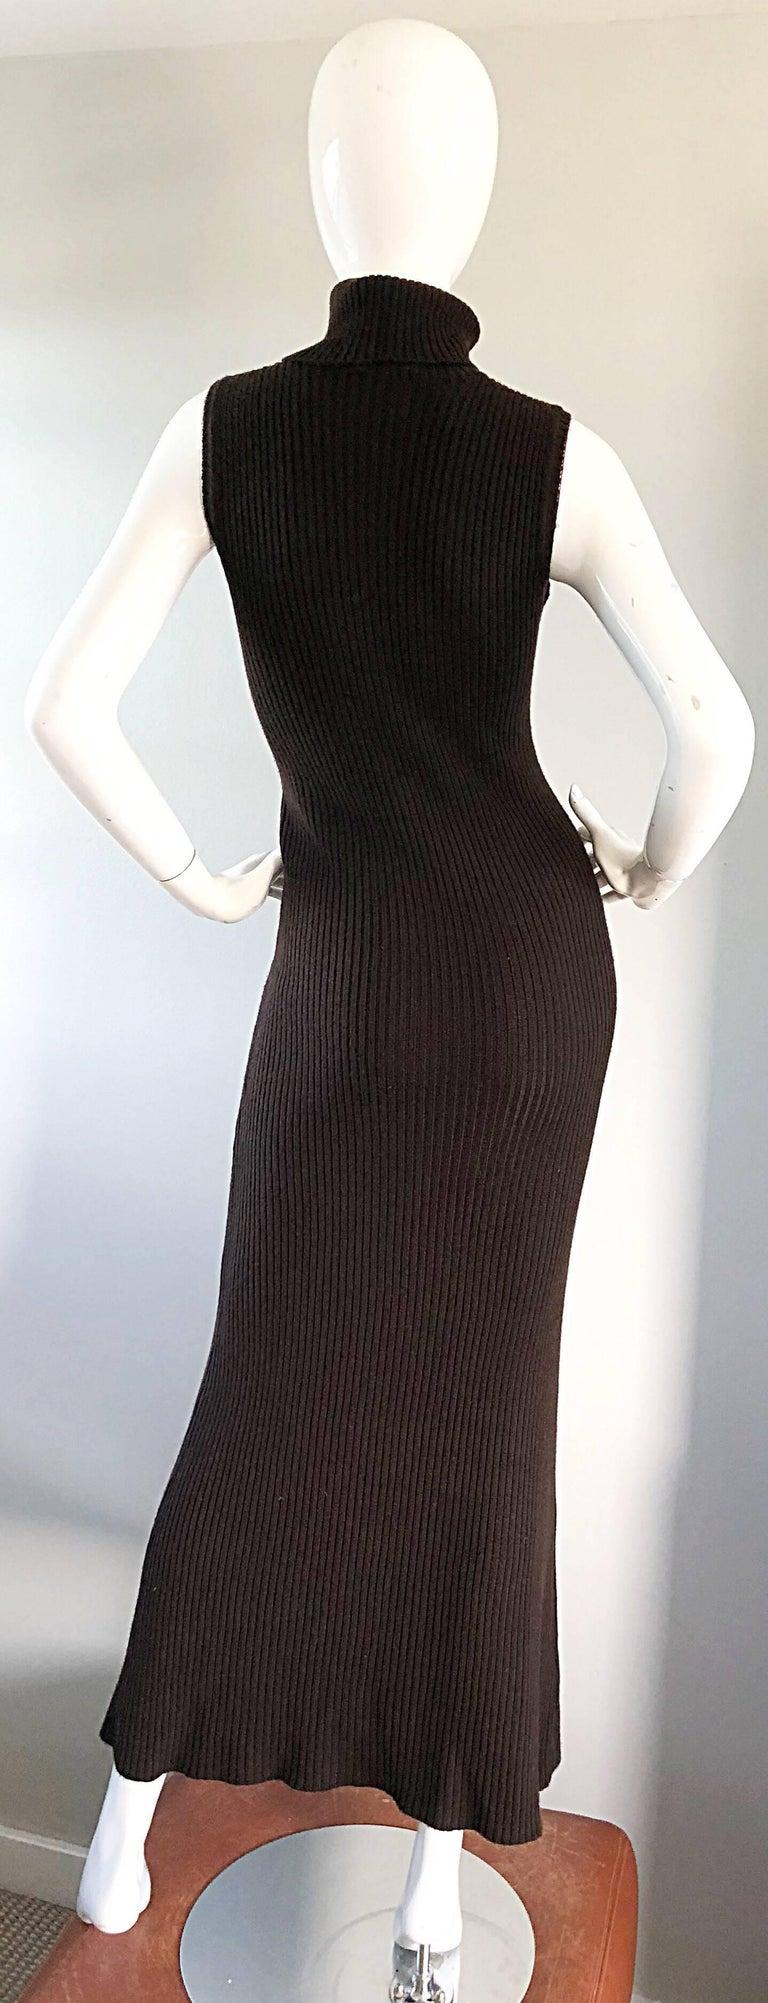 Chanel Vintage 99A Espresso Brown Cashmere Turtleneck 1990s 90s Sweater Dress 6